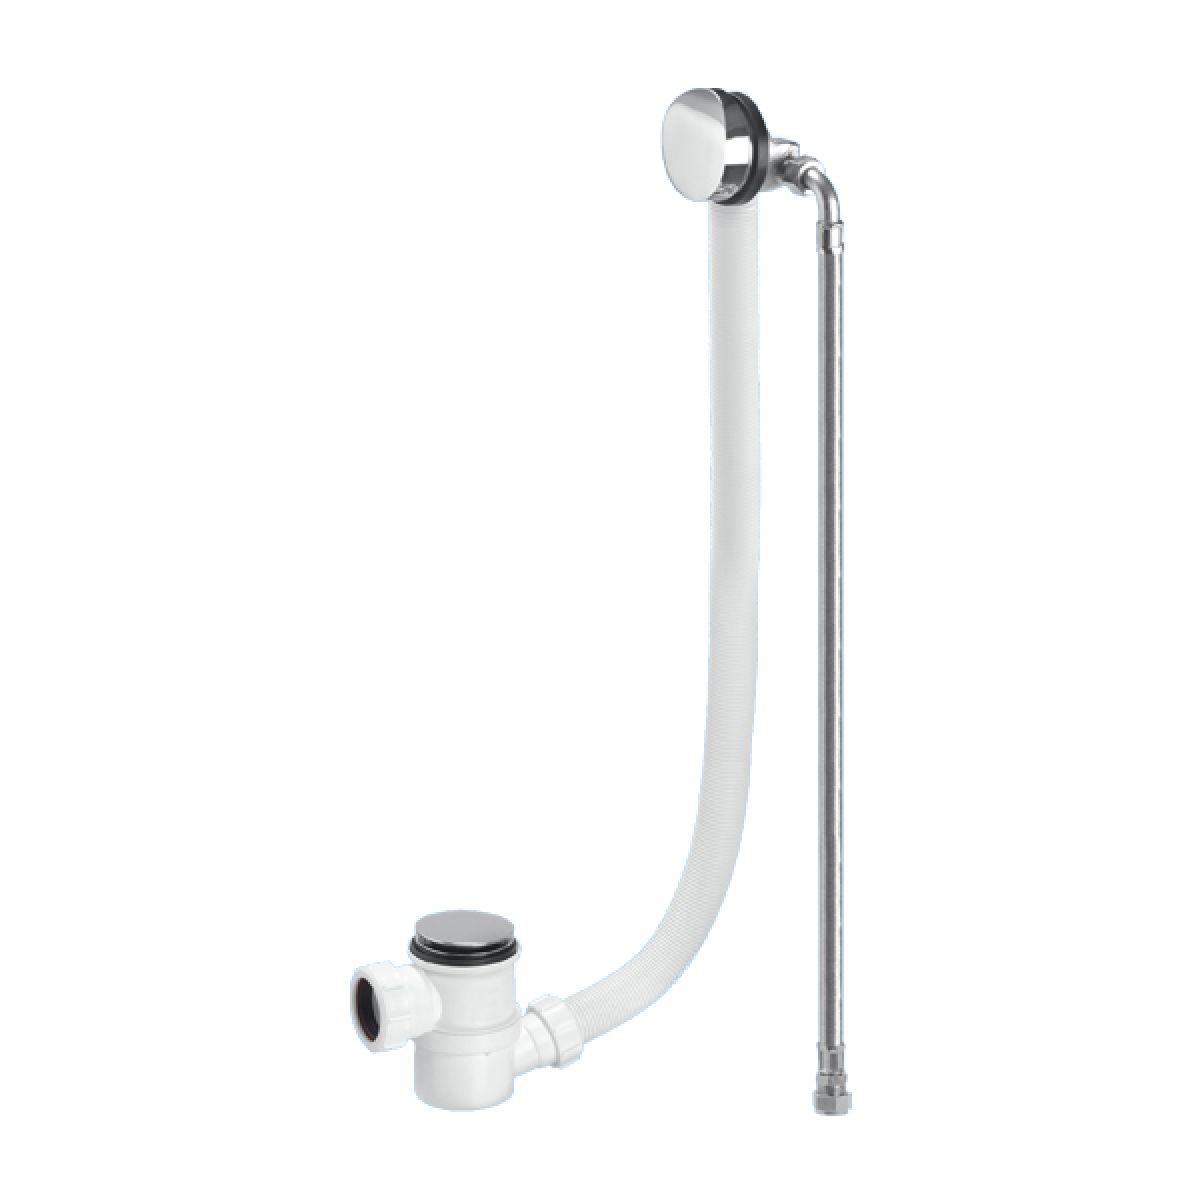 McAlpine HC2650UK-FIL-1M Chrome Plated Brass Bath Filler and Overflow